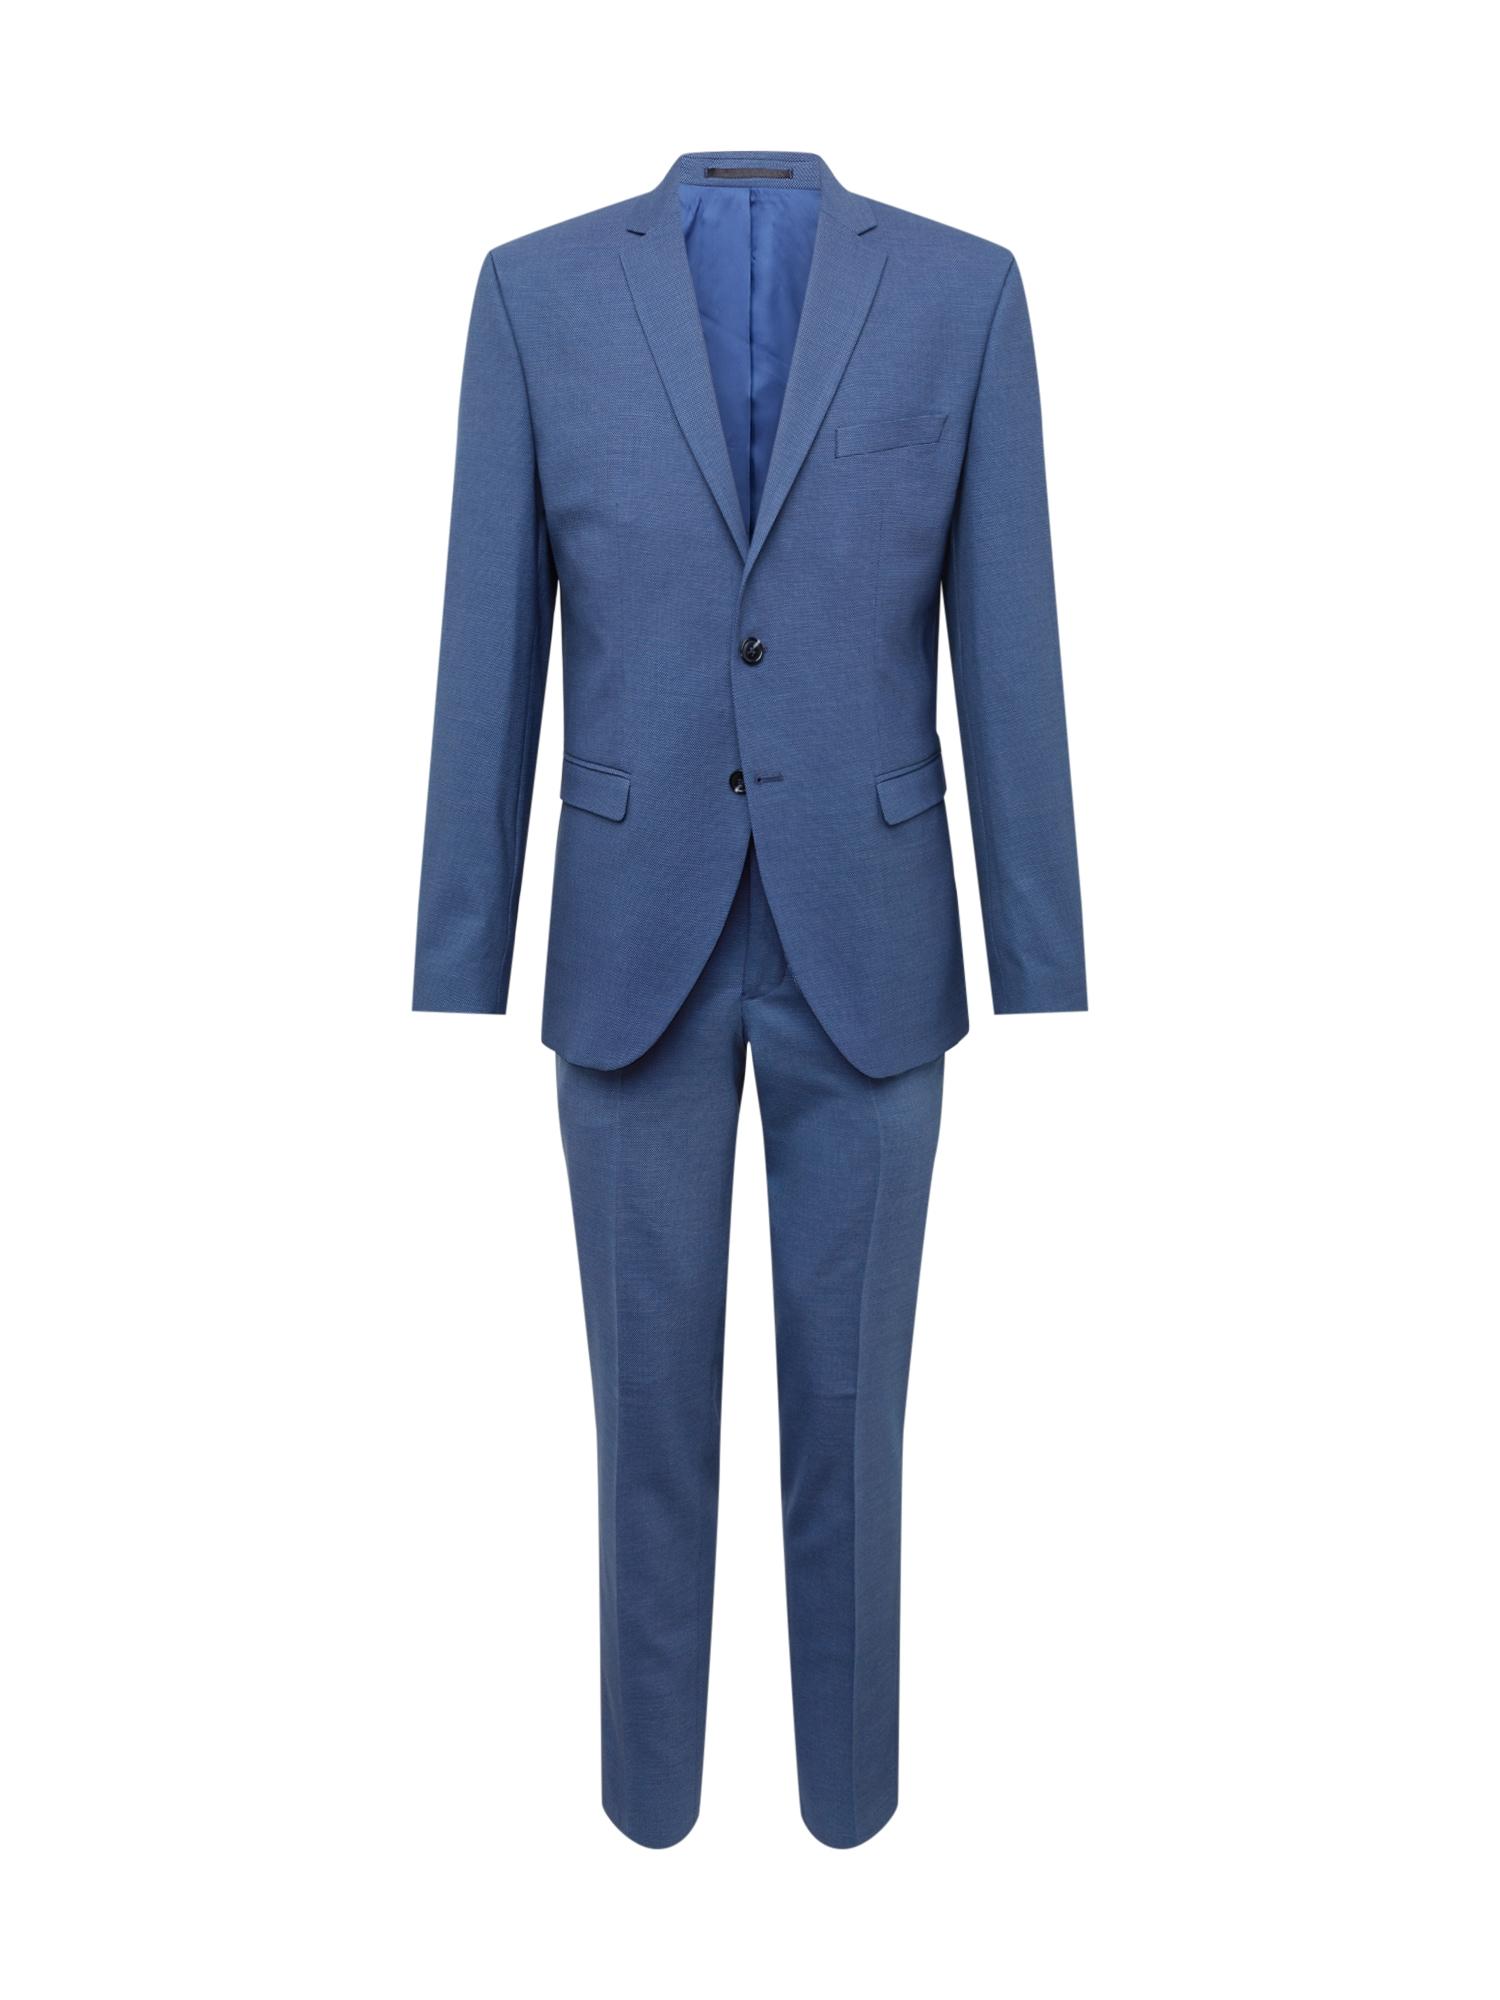 Oblek SLIM-MYLOLOGAN BLUE STRUC SUIT B tmavě modrá SELECTED HOMME